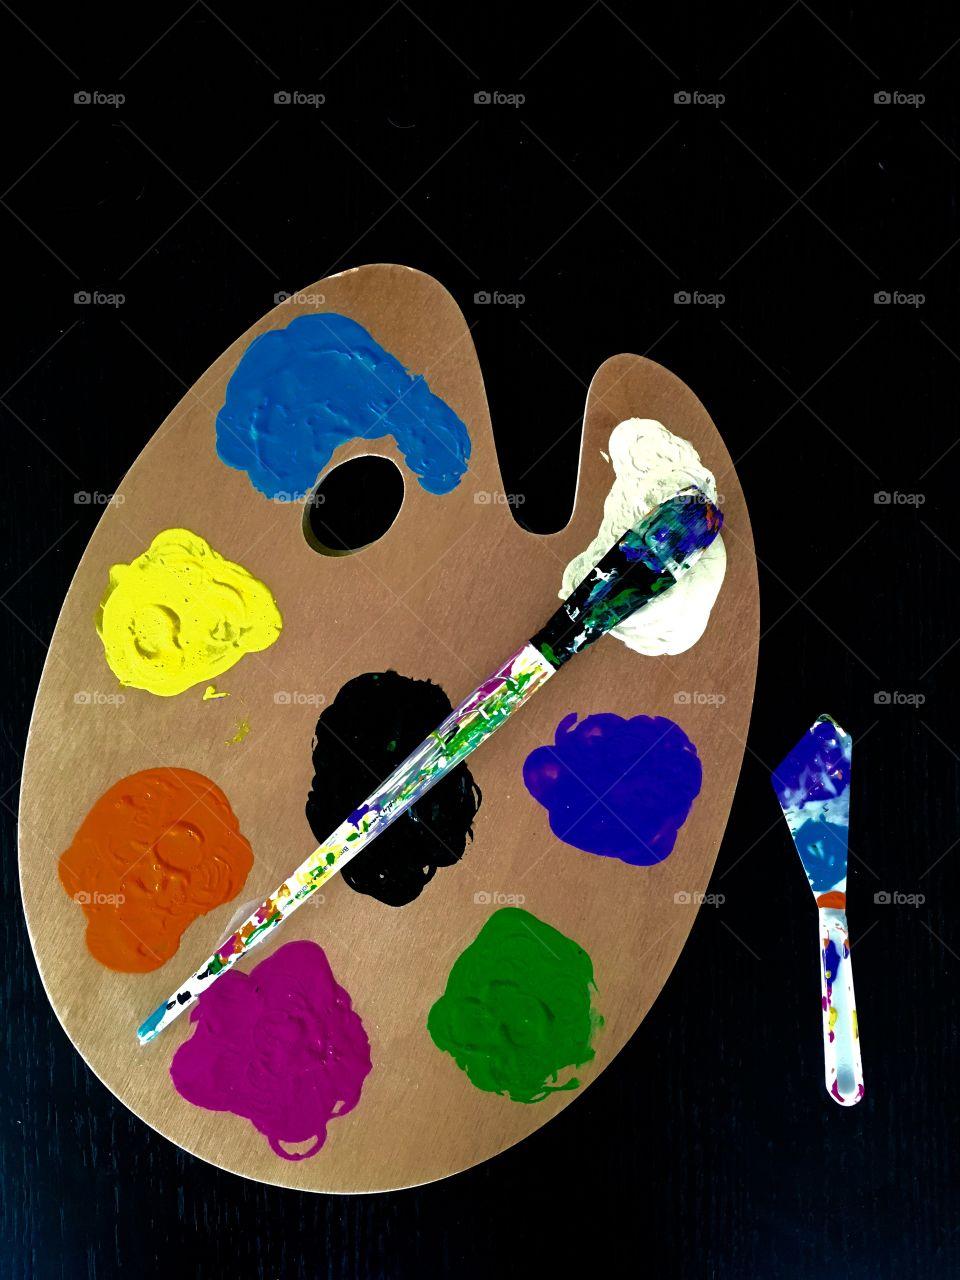 Close-up of a painters pallet